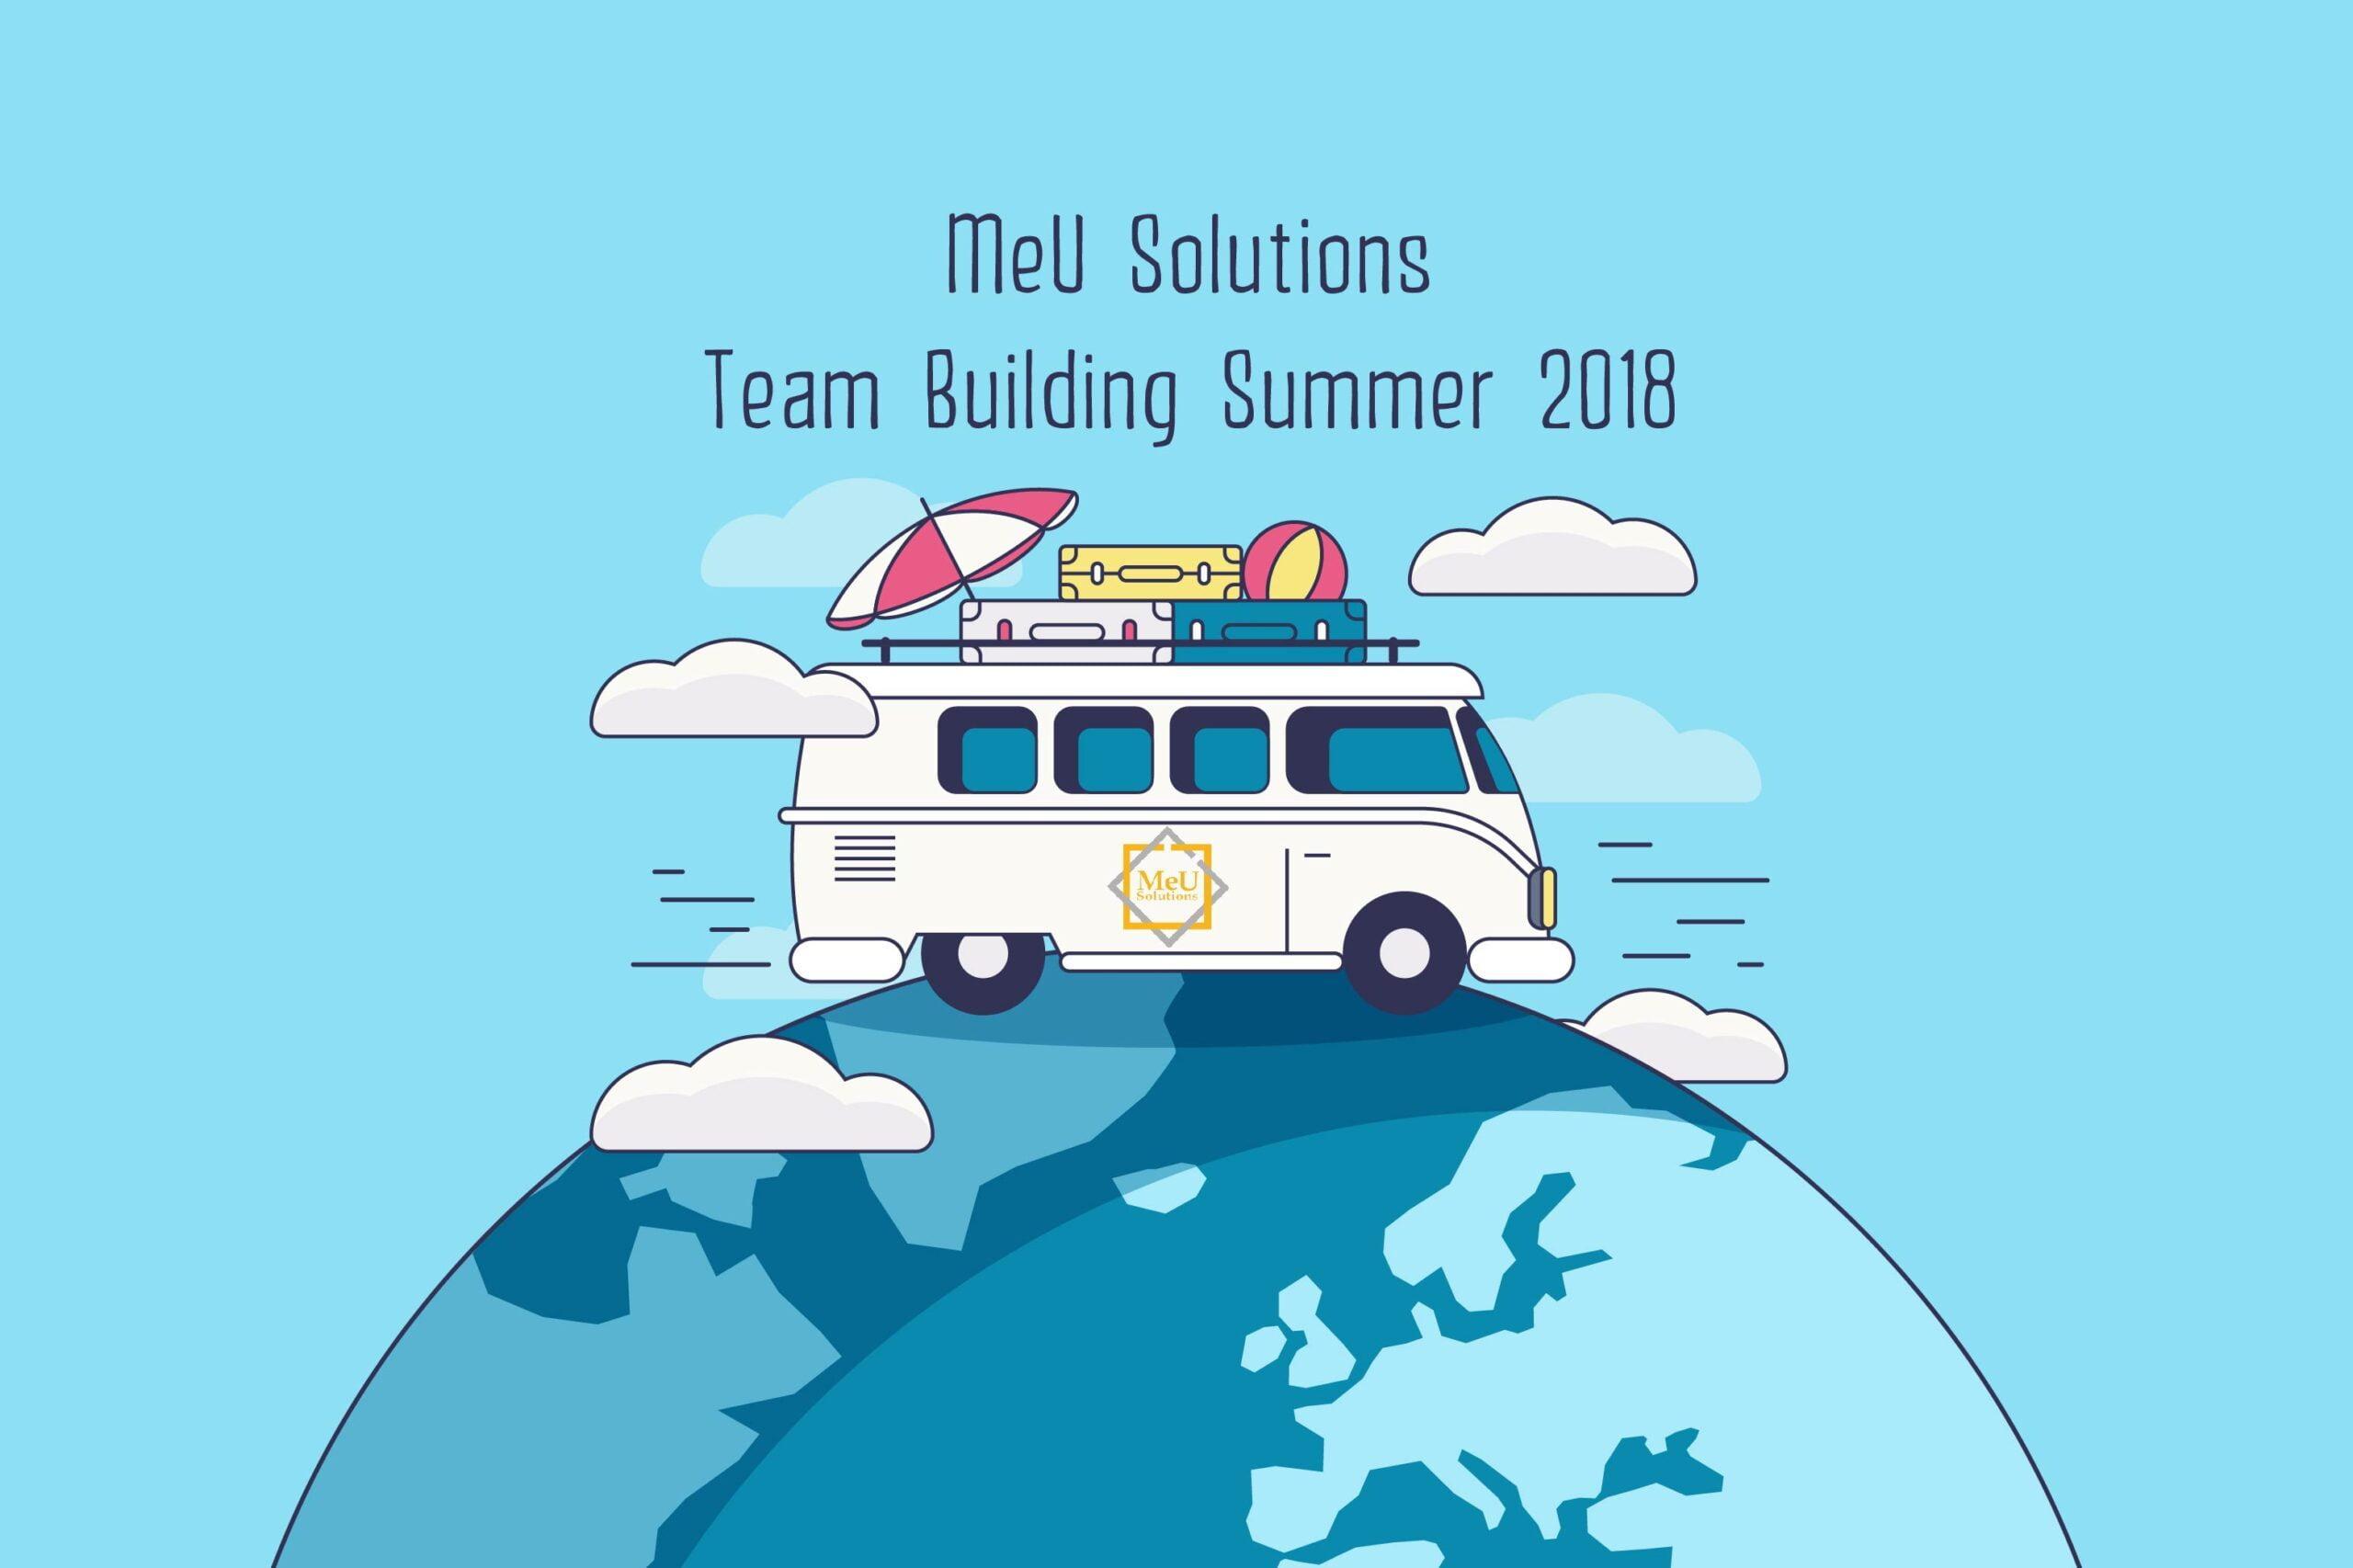 meu solution team building summer 2018